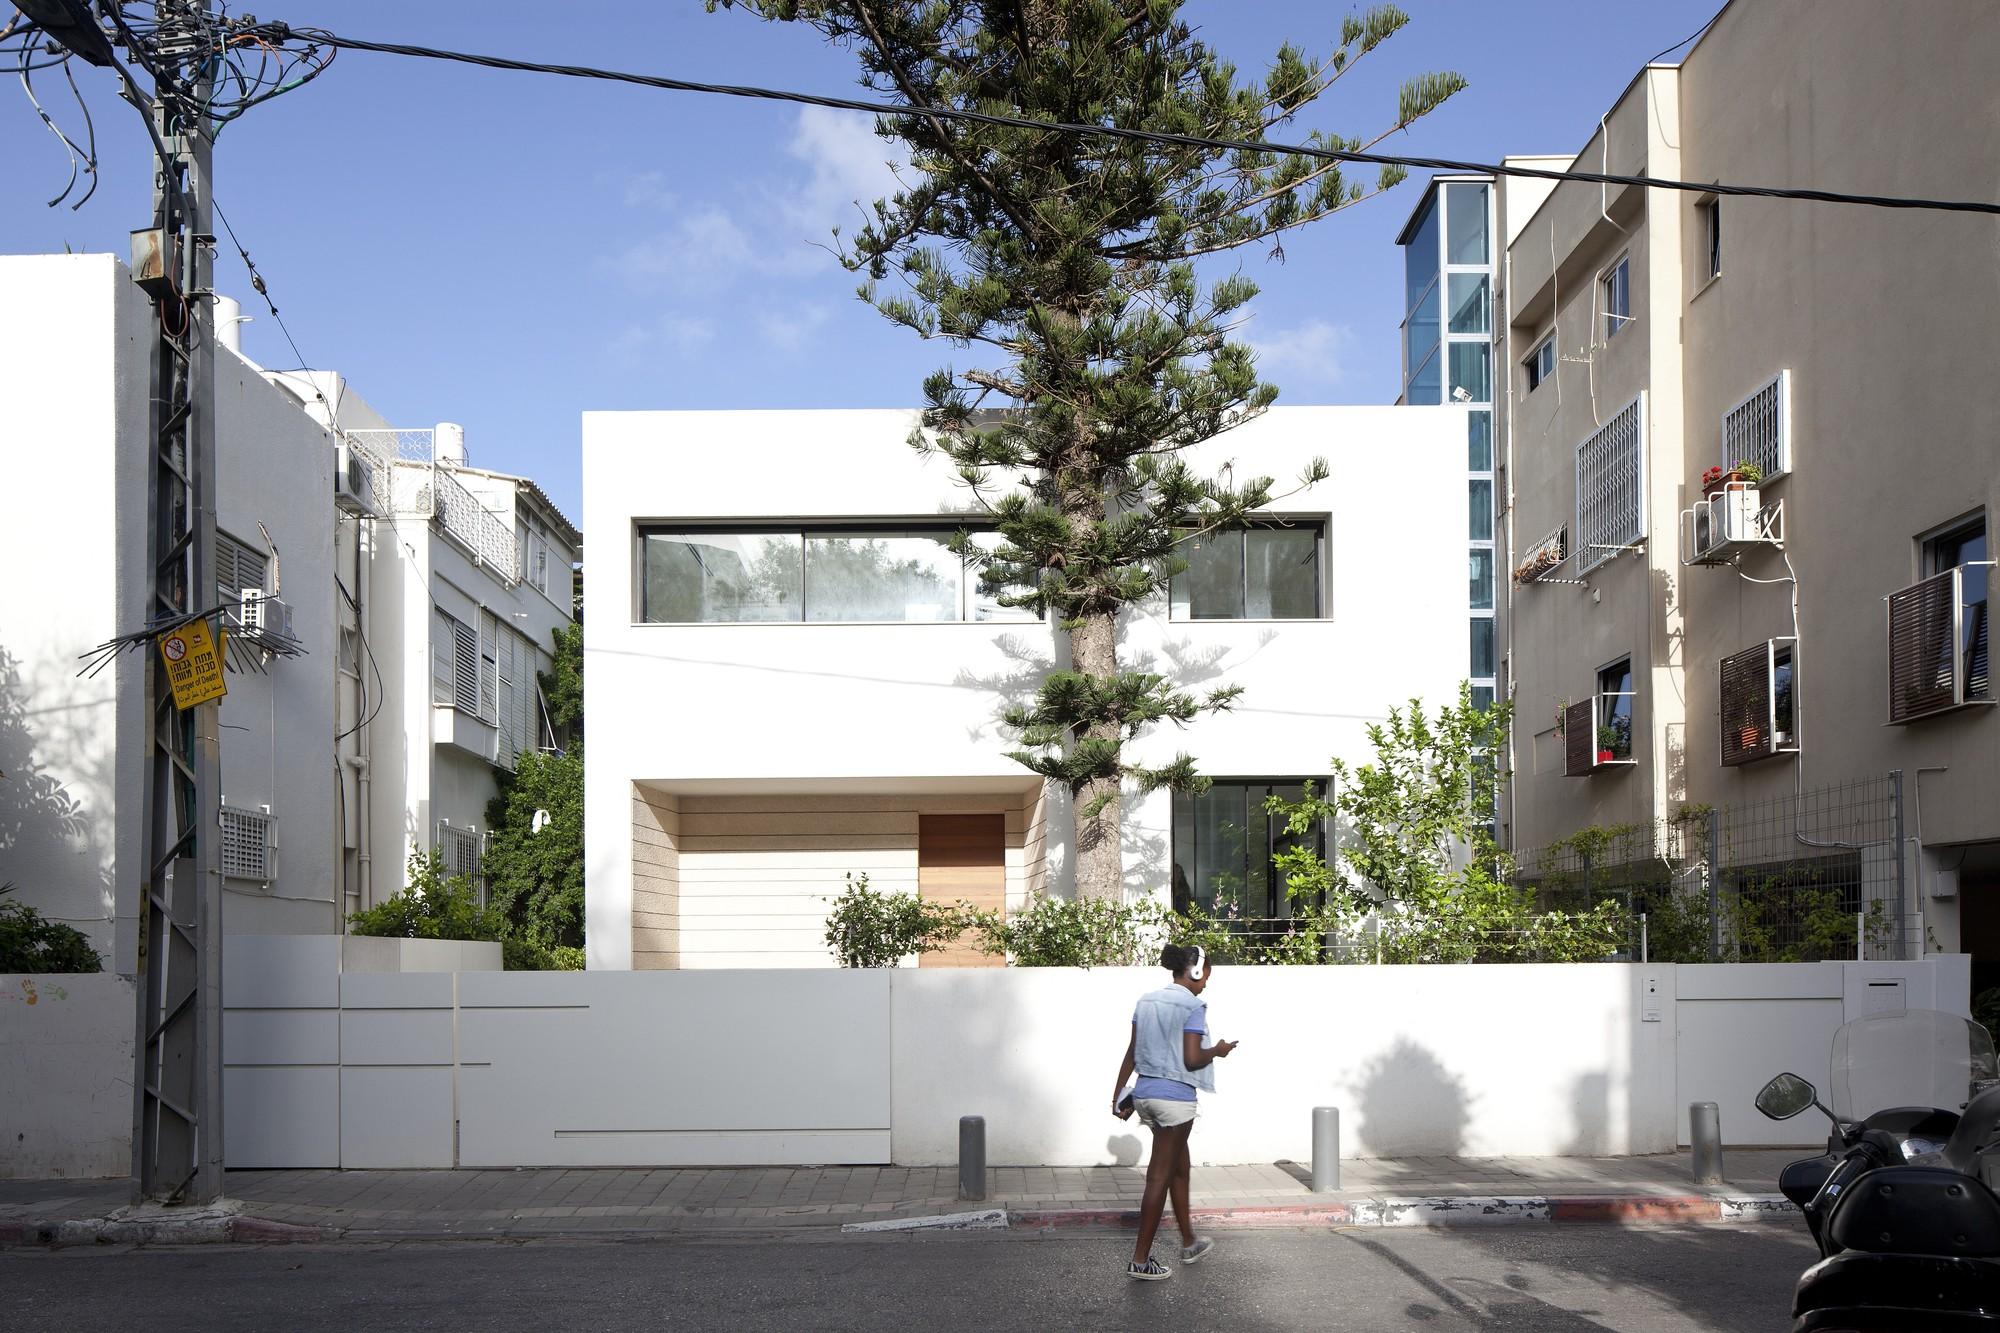 An Urban Villa / Pitsou Kedem Architects, © Amit Geron